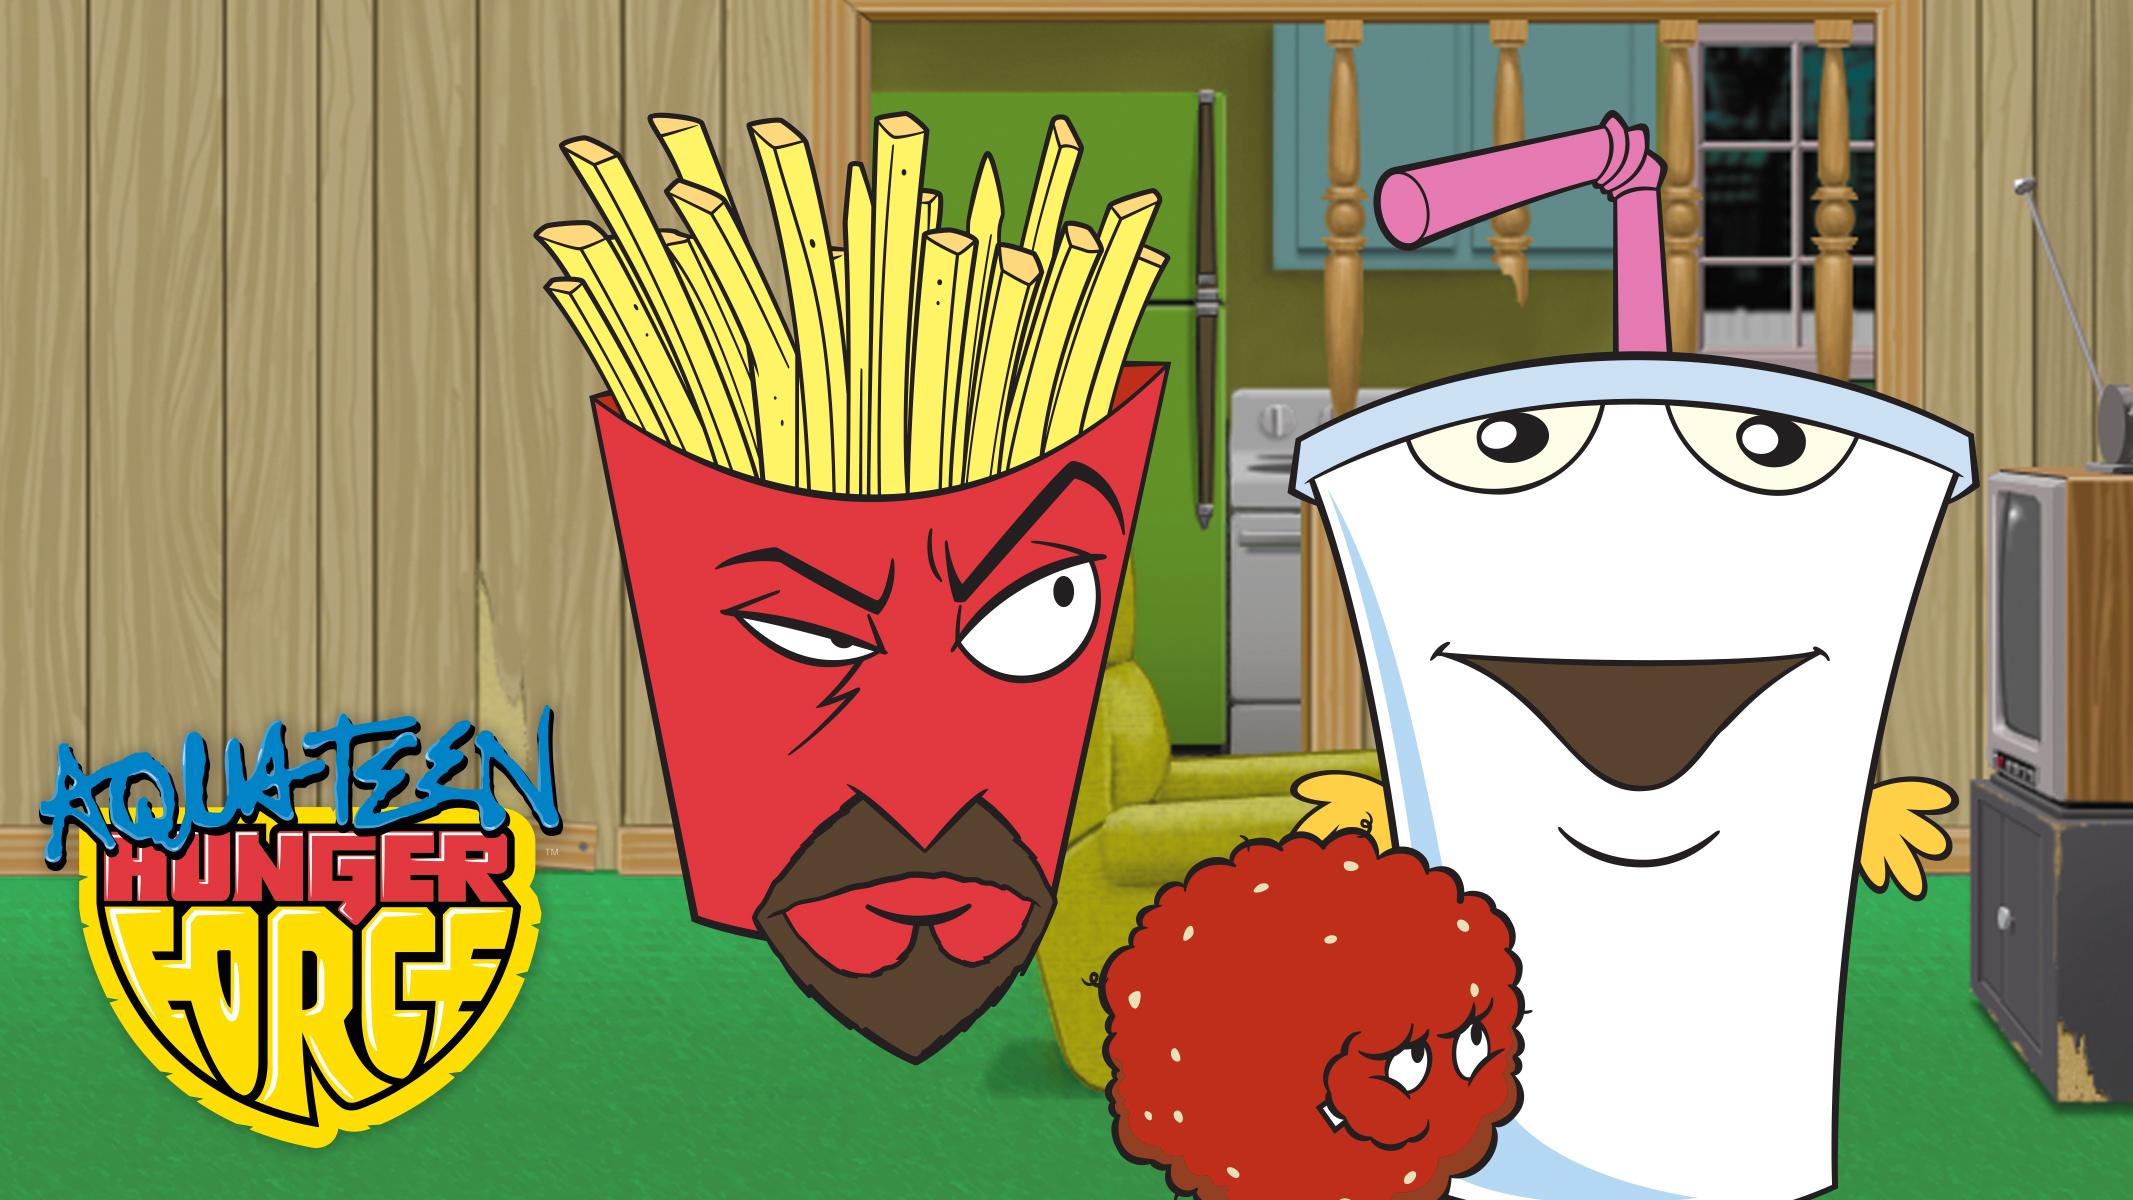 Aqua Teen Hunger Force - graphic image